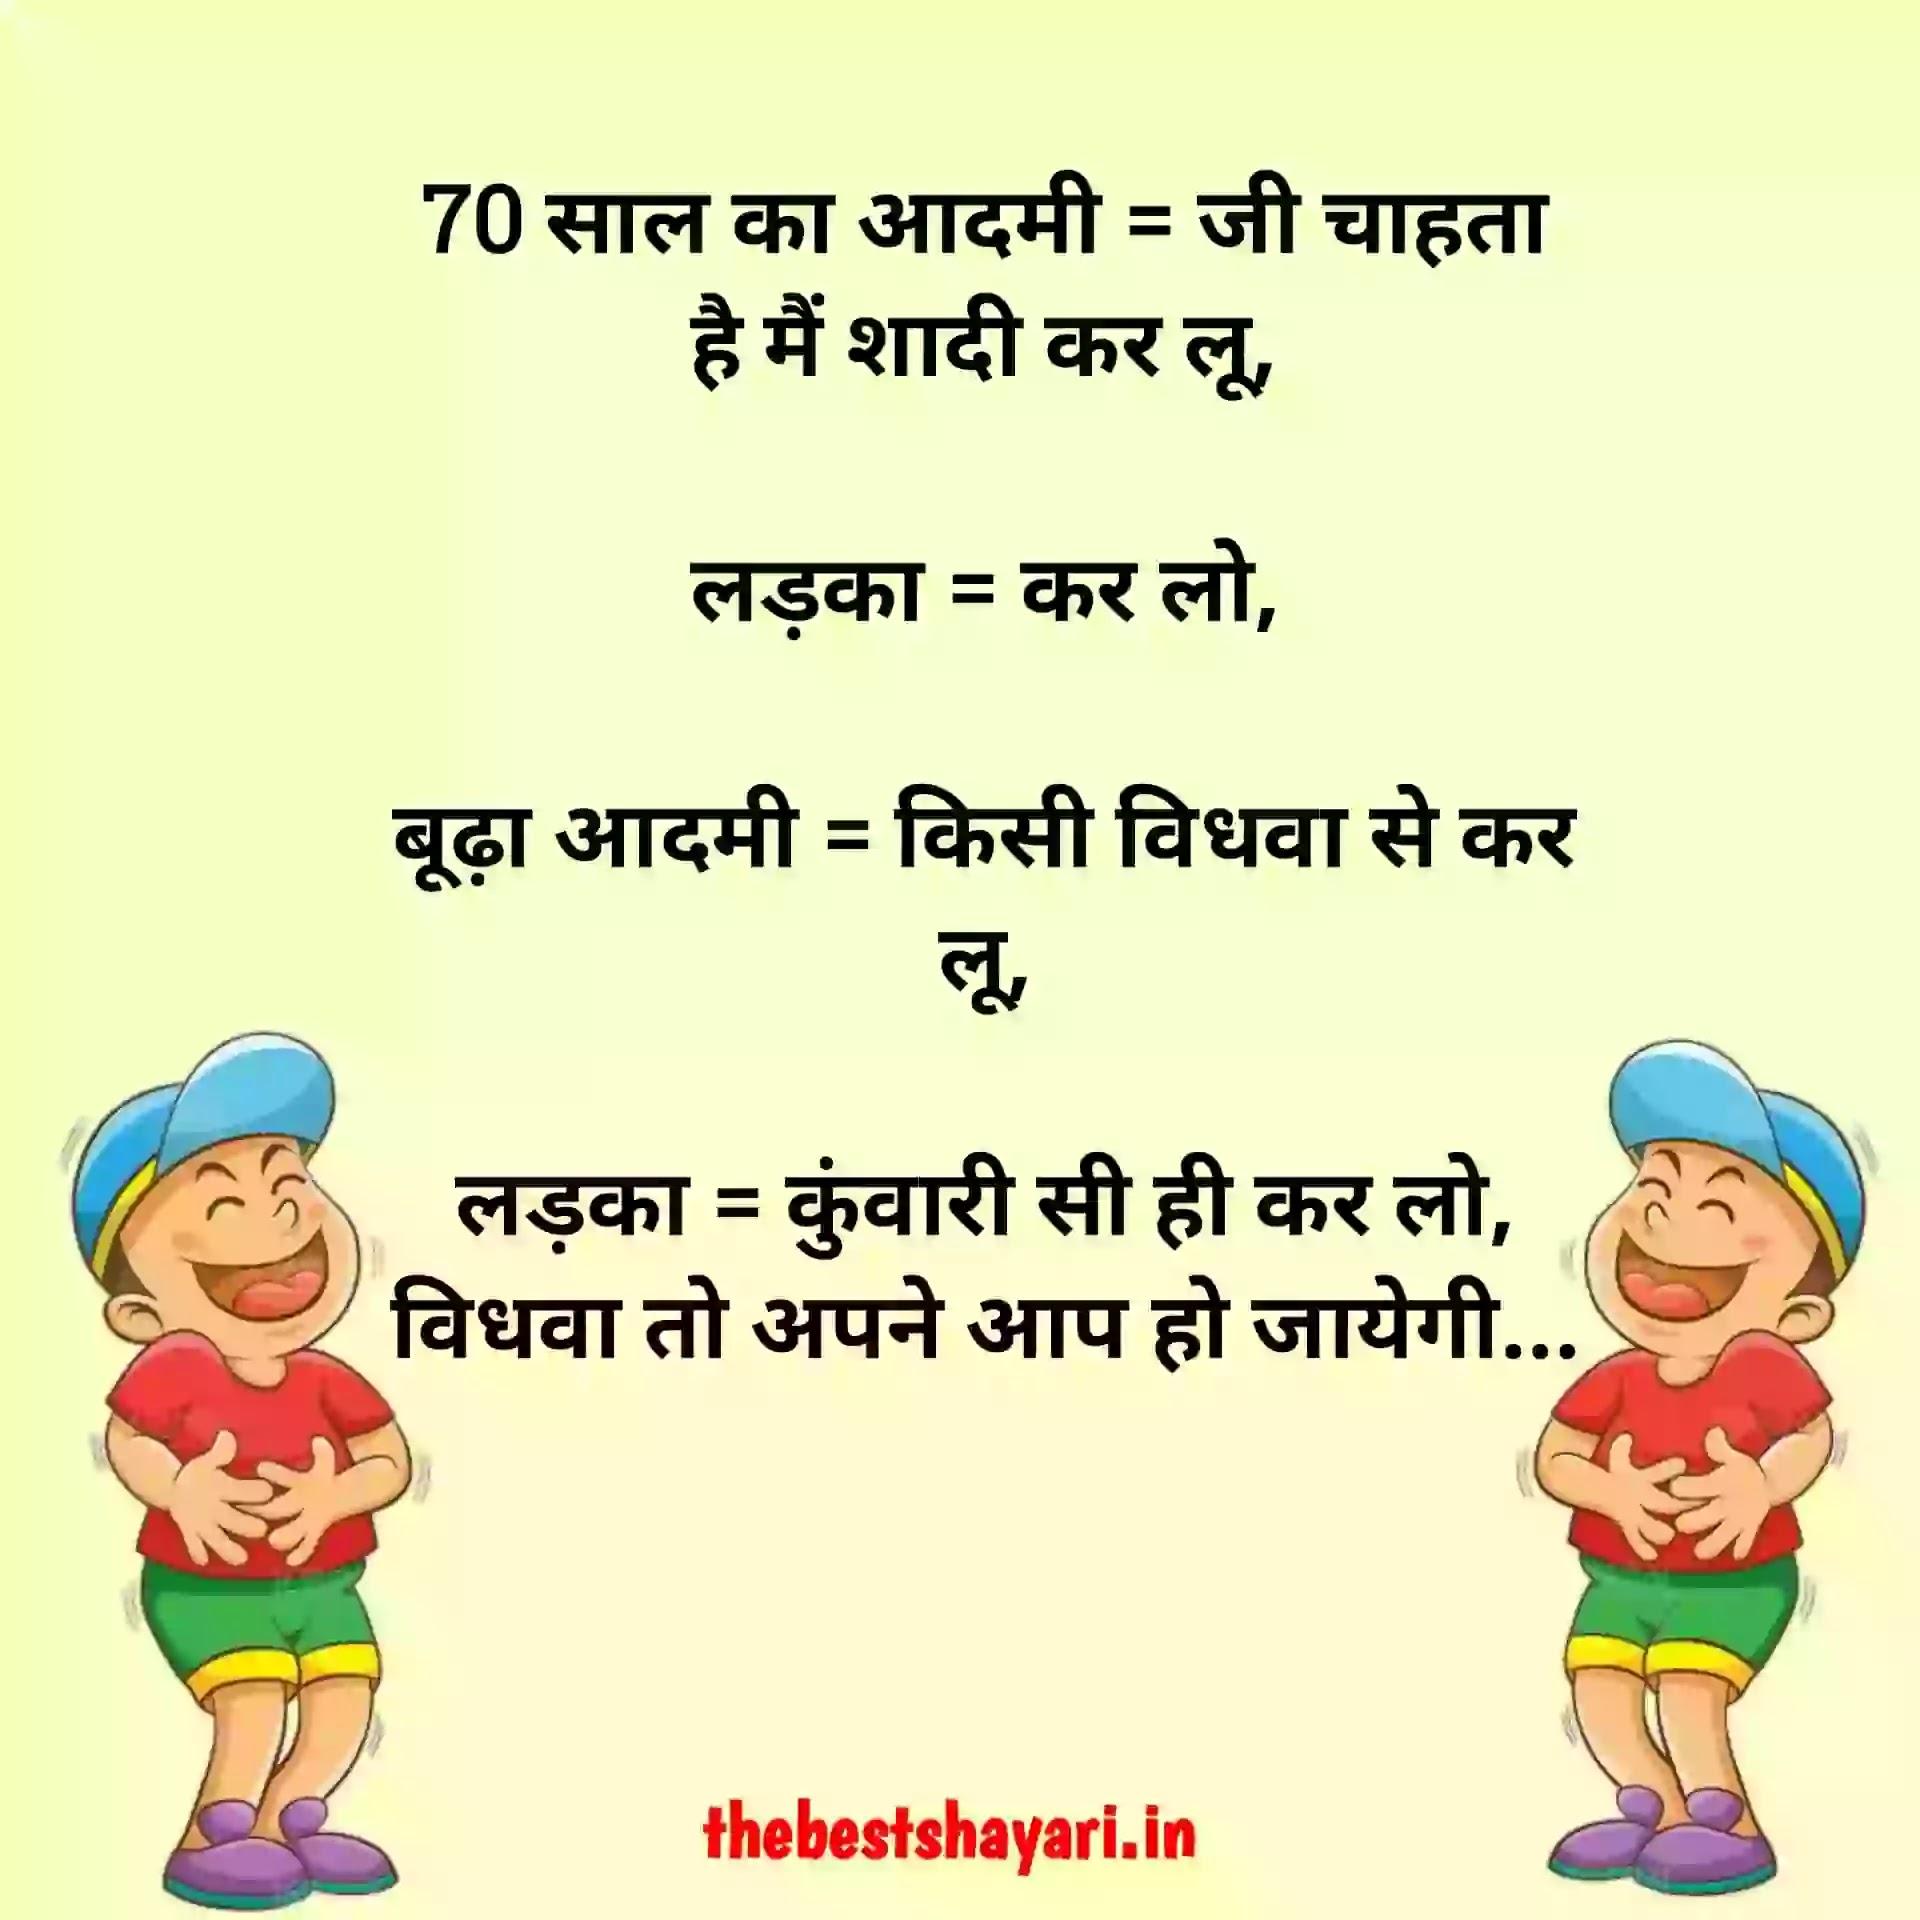 SMS in Hindi funny jokes